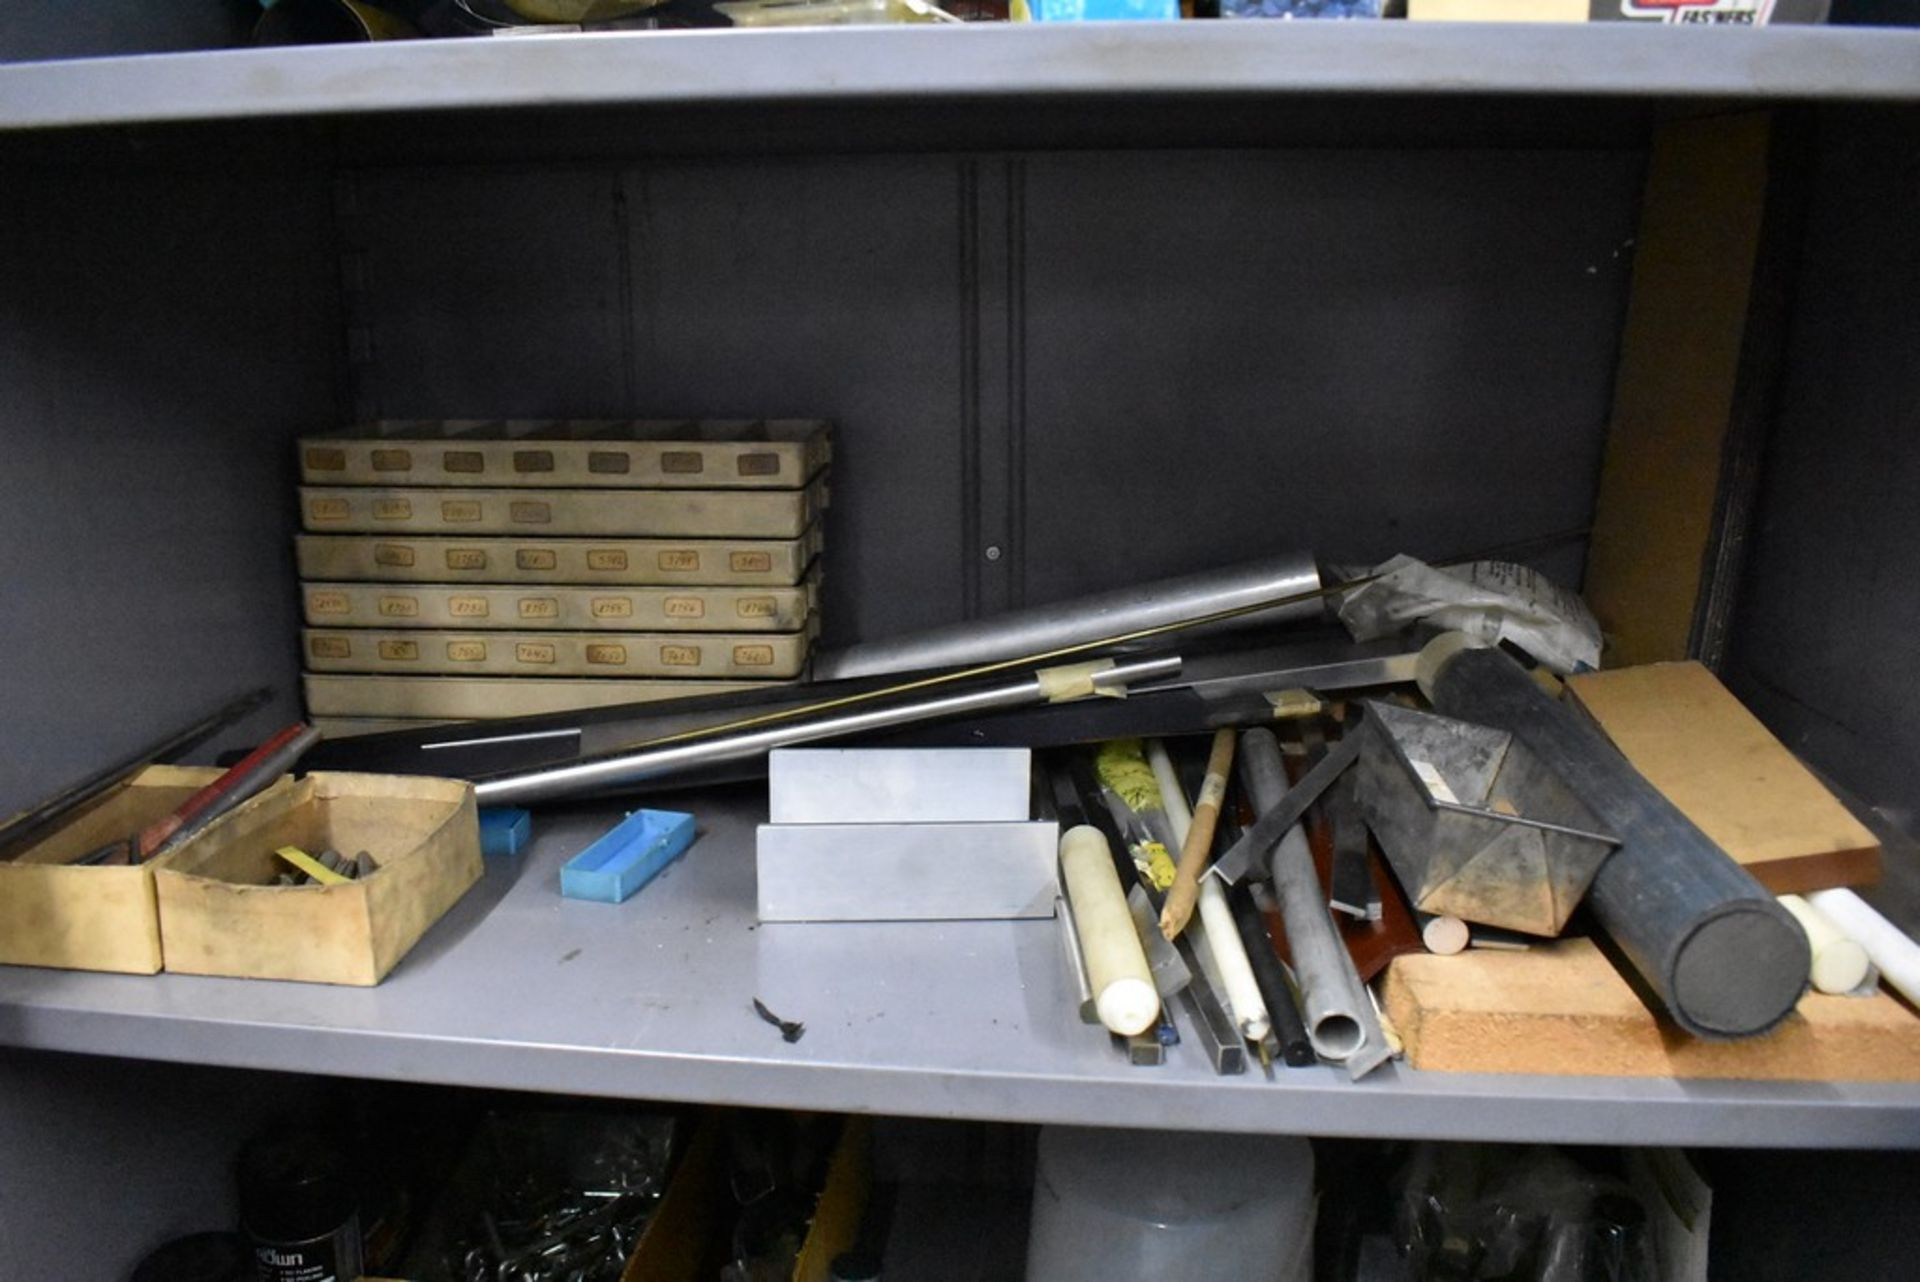 HOBART THIRTEEN DRAWER STEEL TOOL CABINET - Image 5 of 10